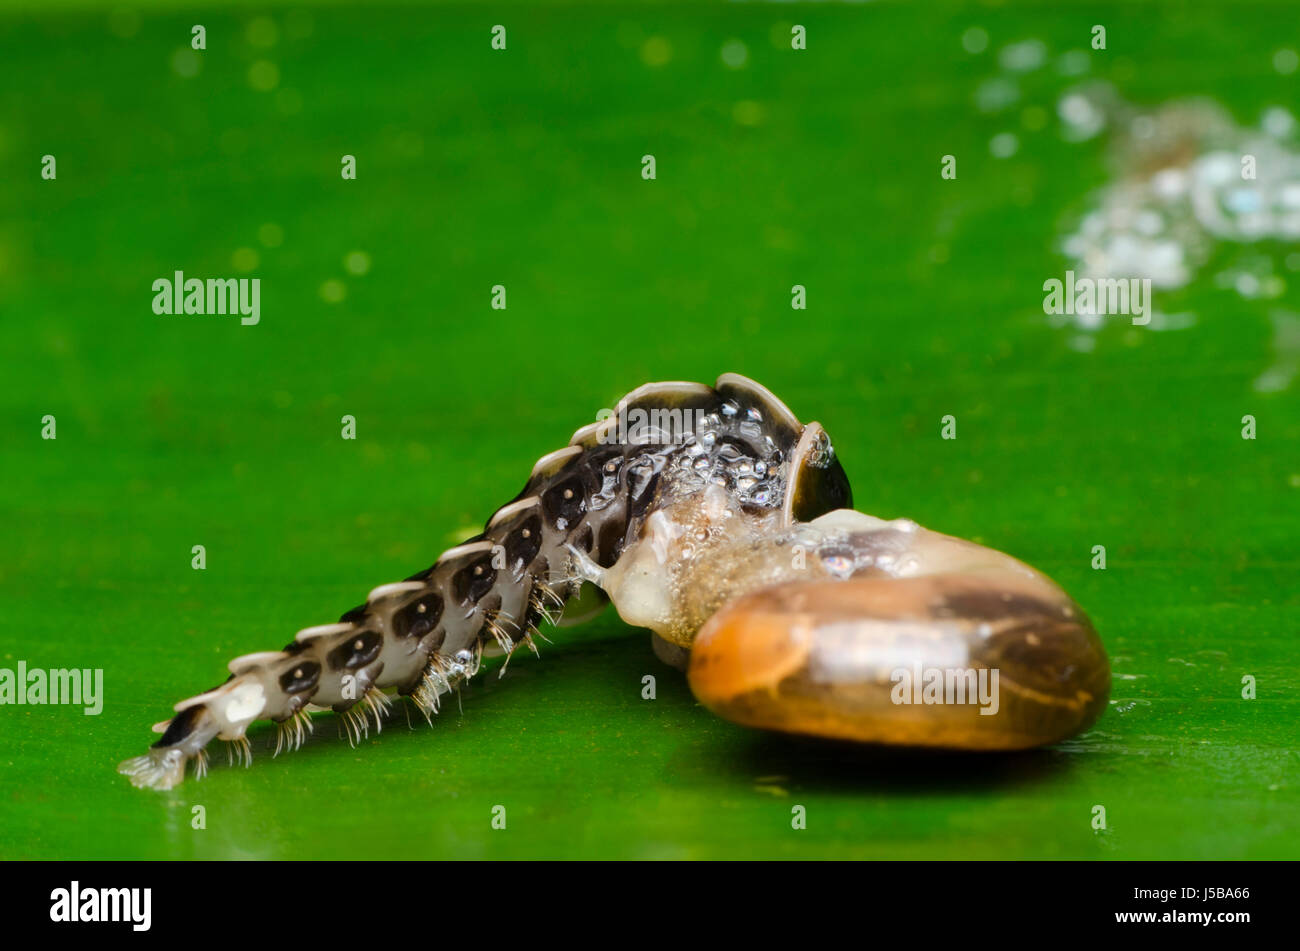 firefly beetle larvae feeding on snail - Stock Image